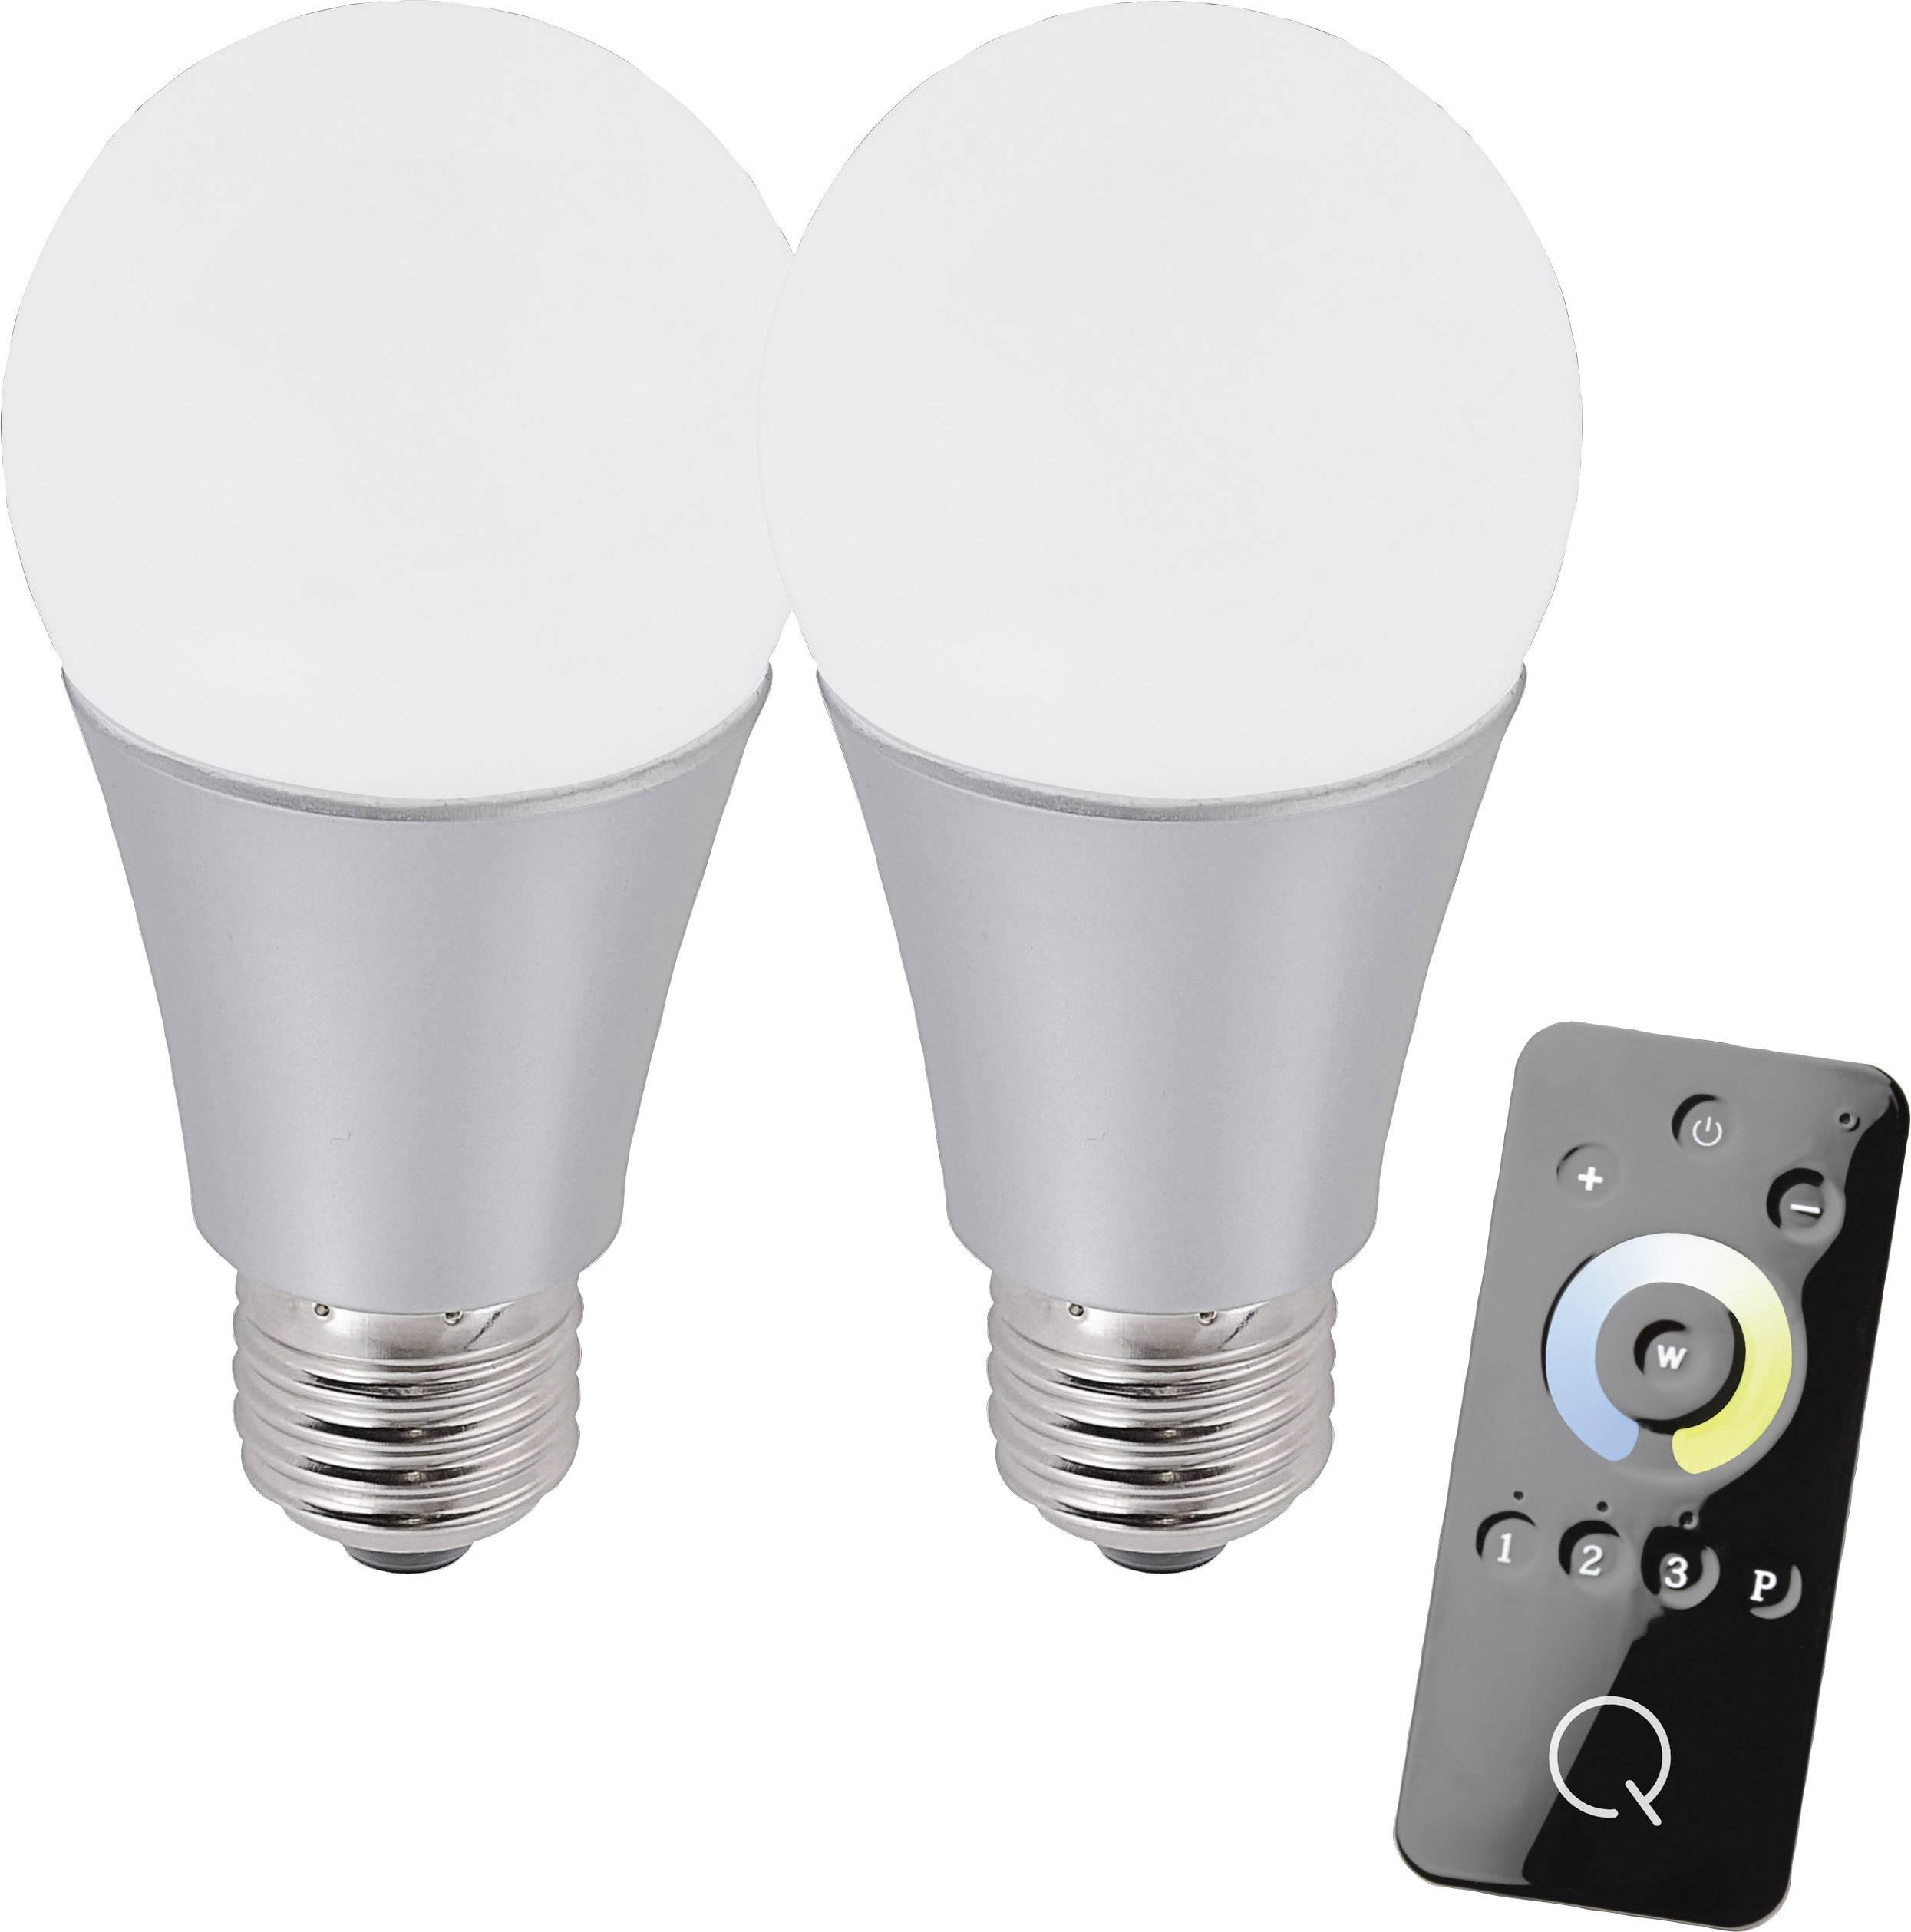 Štartovacia sada osvetlenia Paul Neuhaus Q®;Q®, E27, 8.5 W, teplá biela, neutrálne biela, chladná biela